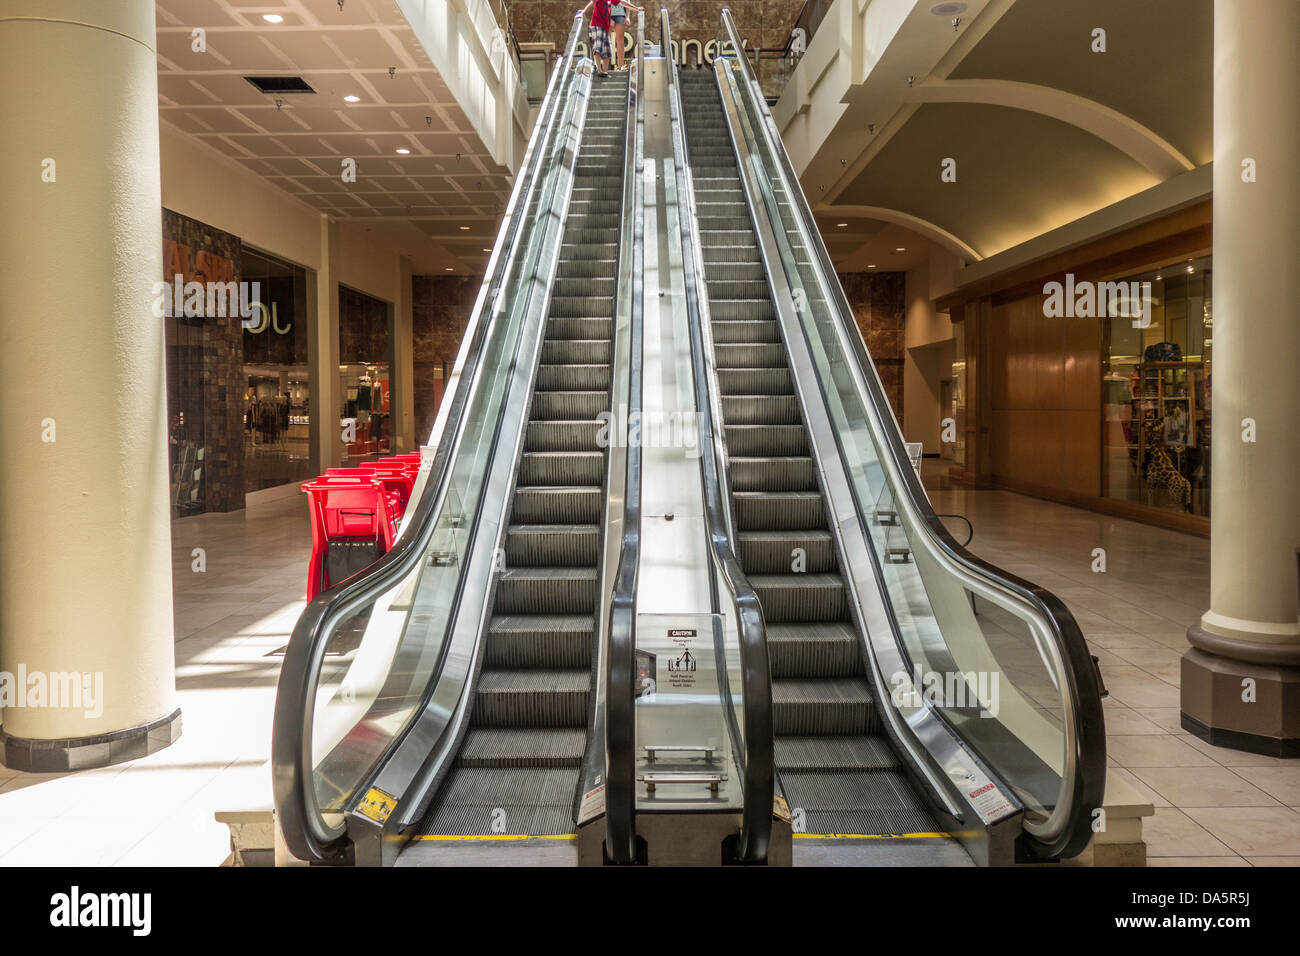 An escalator in a shopping mall. - Stock Image